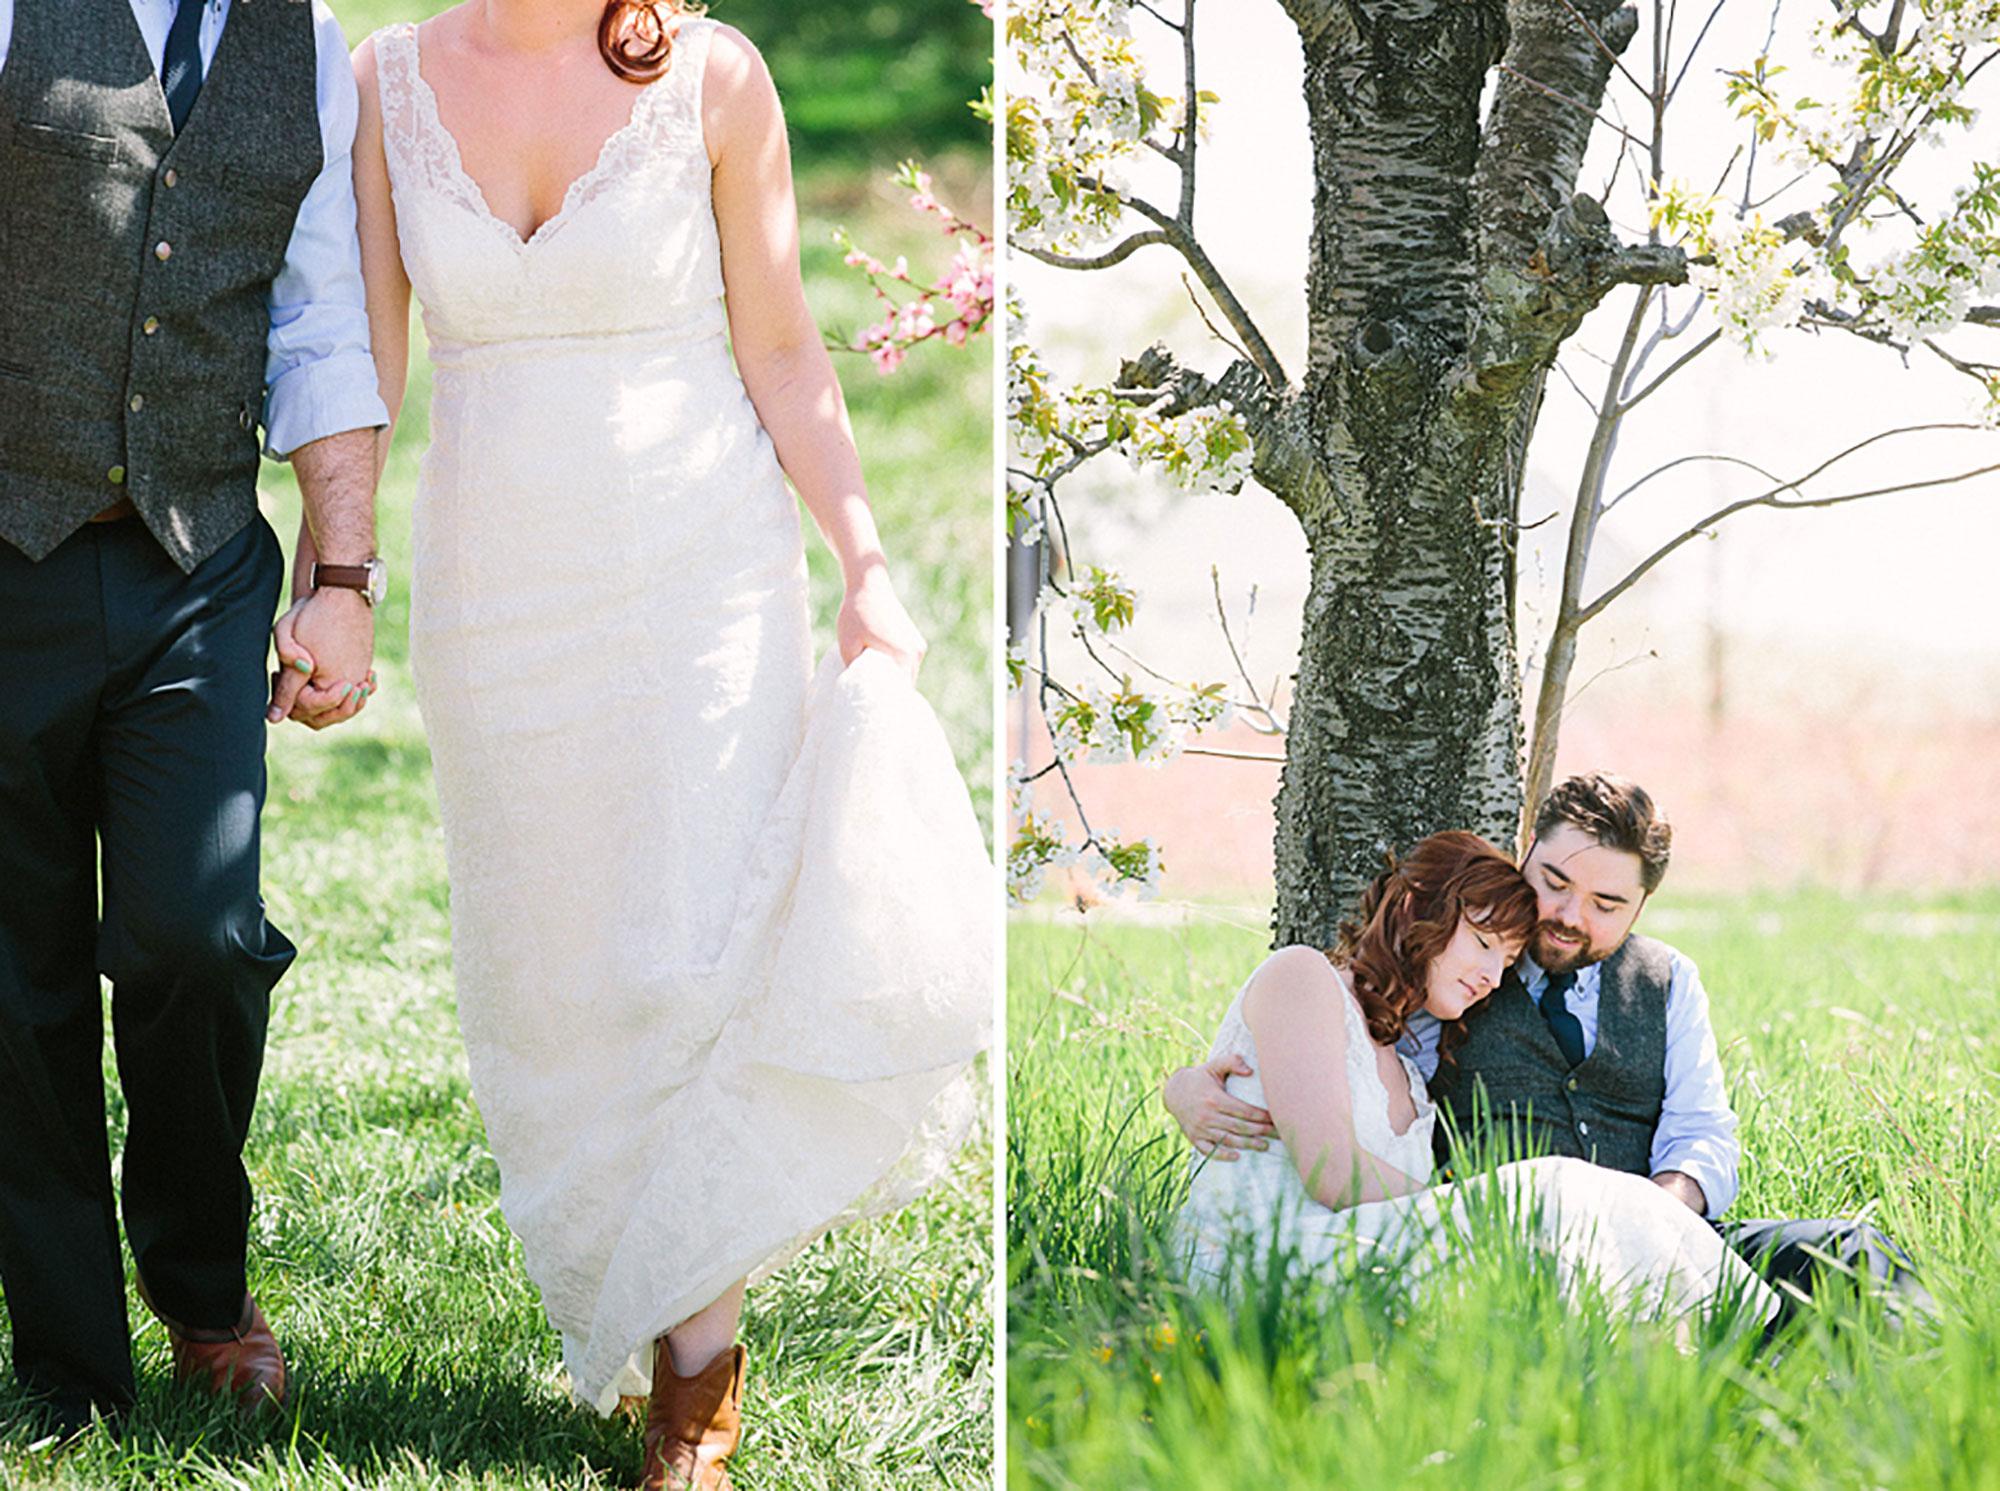 Navy-Hall-Wedding-Vineyard-Bride-Photo-By-Andrew-Mark-Photography-021.jpg